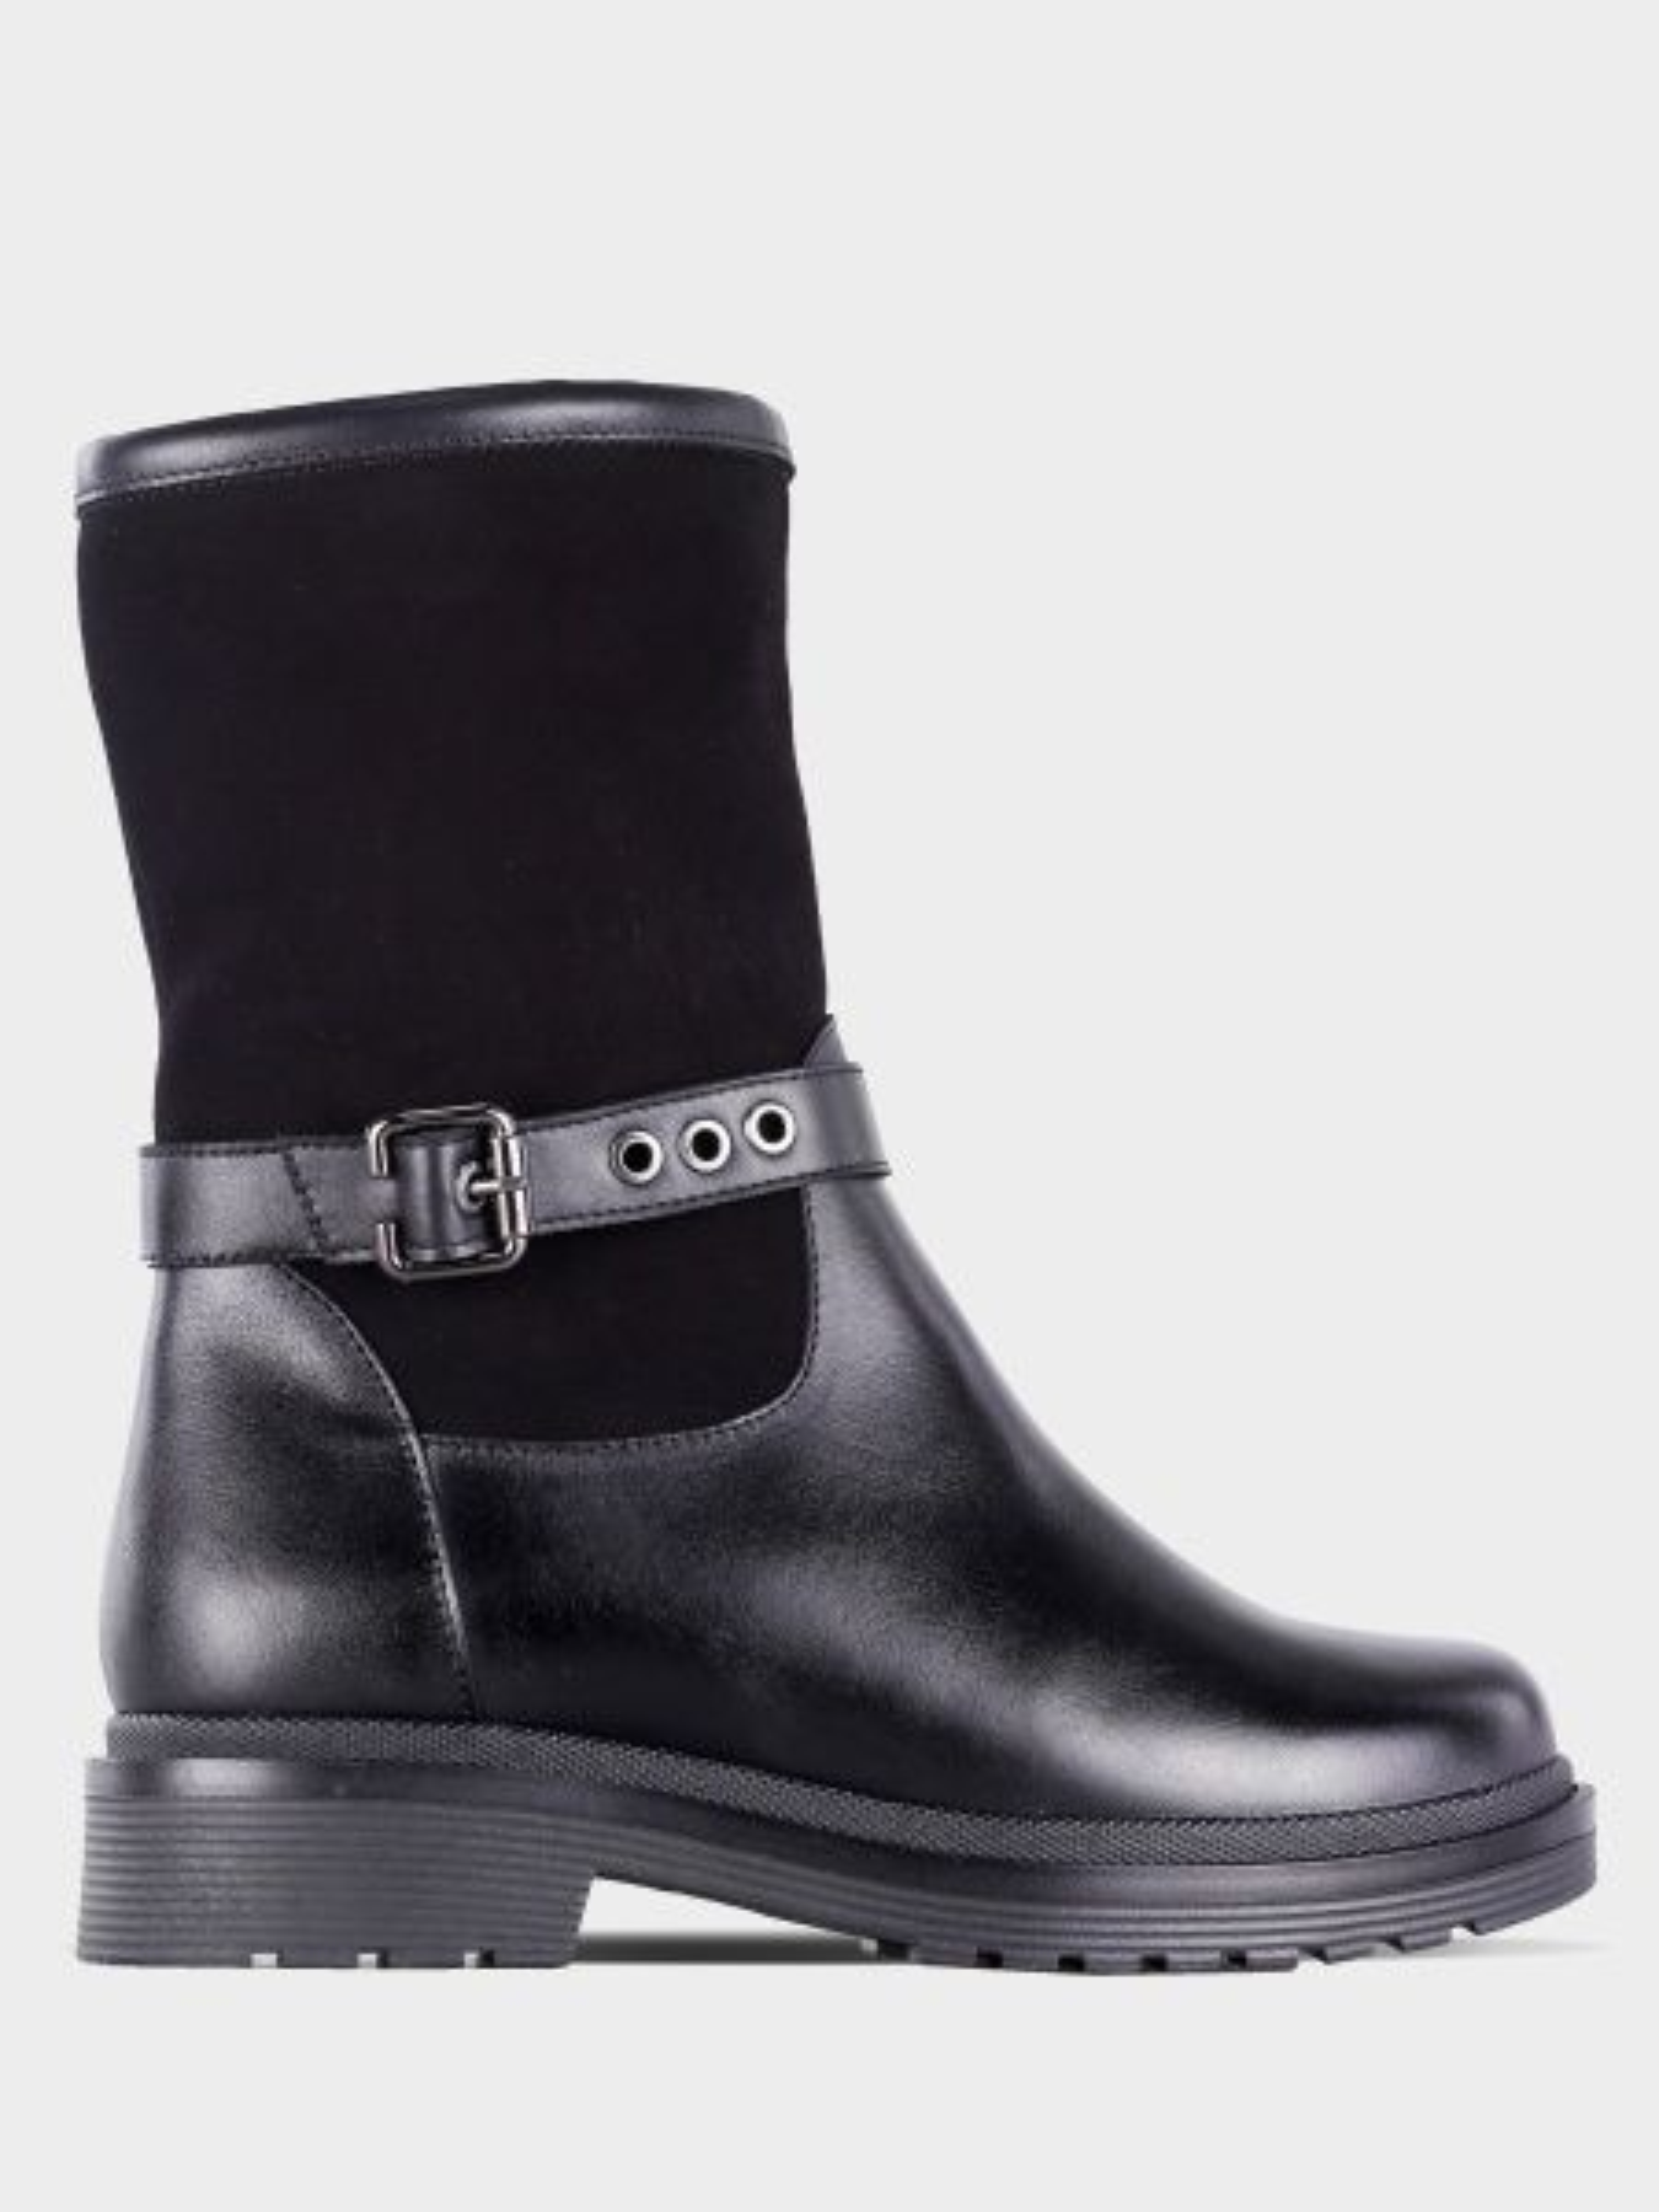 Ботинки для женщин GAMA 2Z73 купить онлайн, 2017